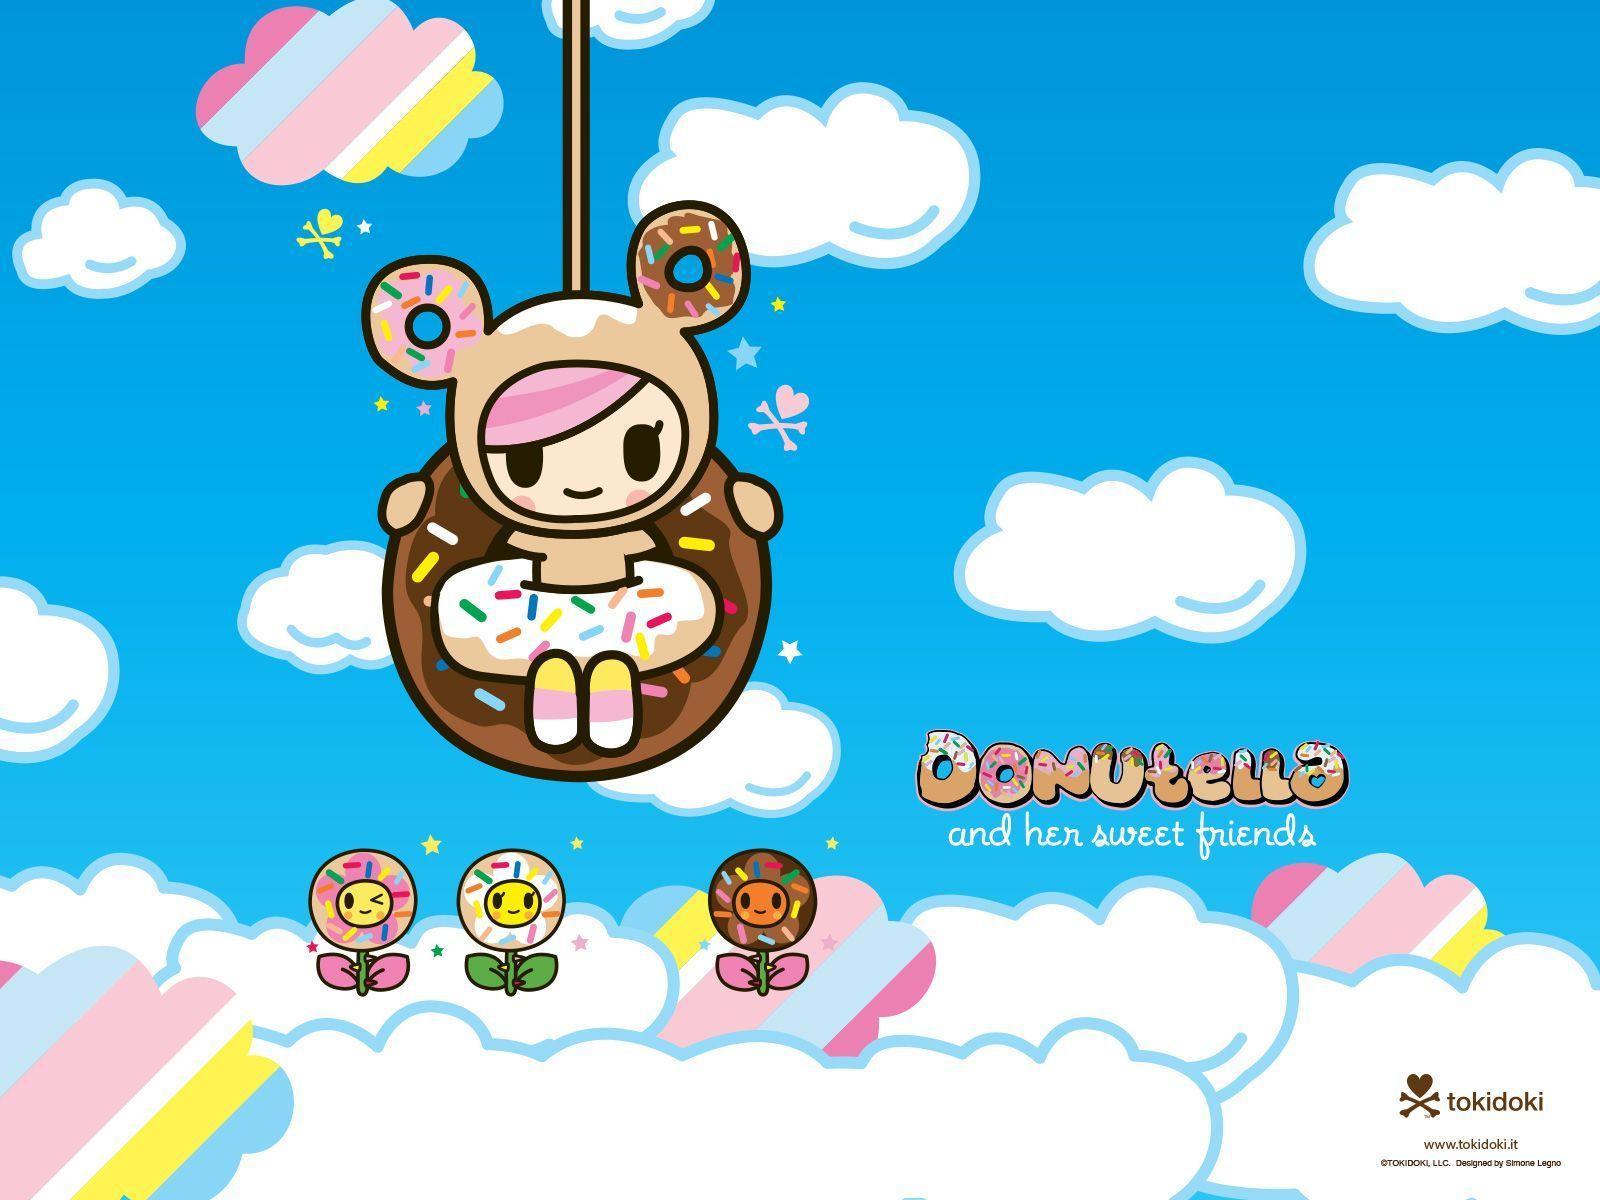 Cute Hello Kitty Wallpaper Android Tokidoki Desktop Wallpapers Wallpaper Cave